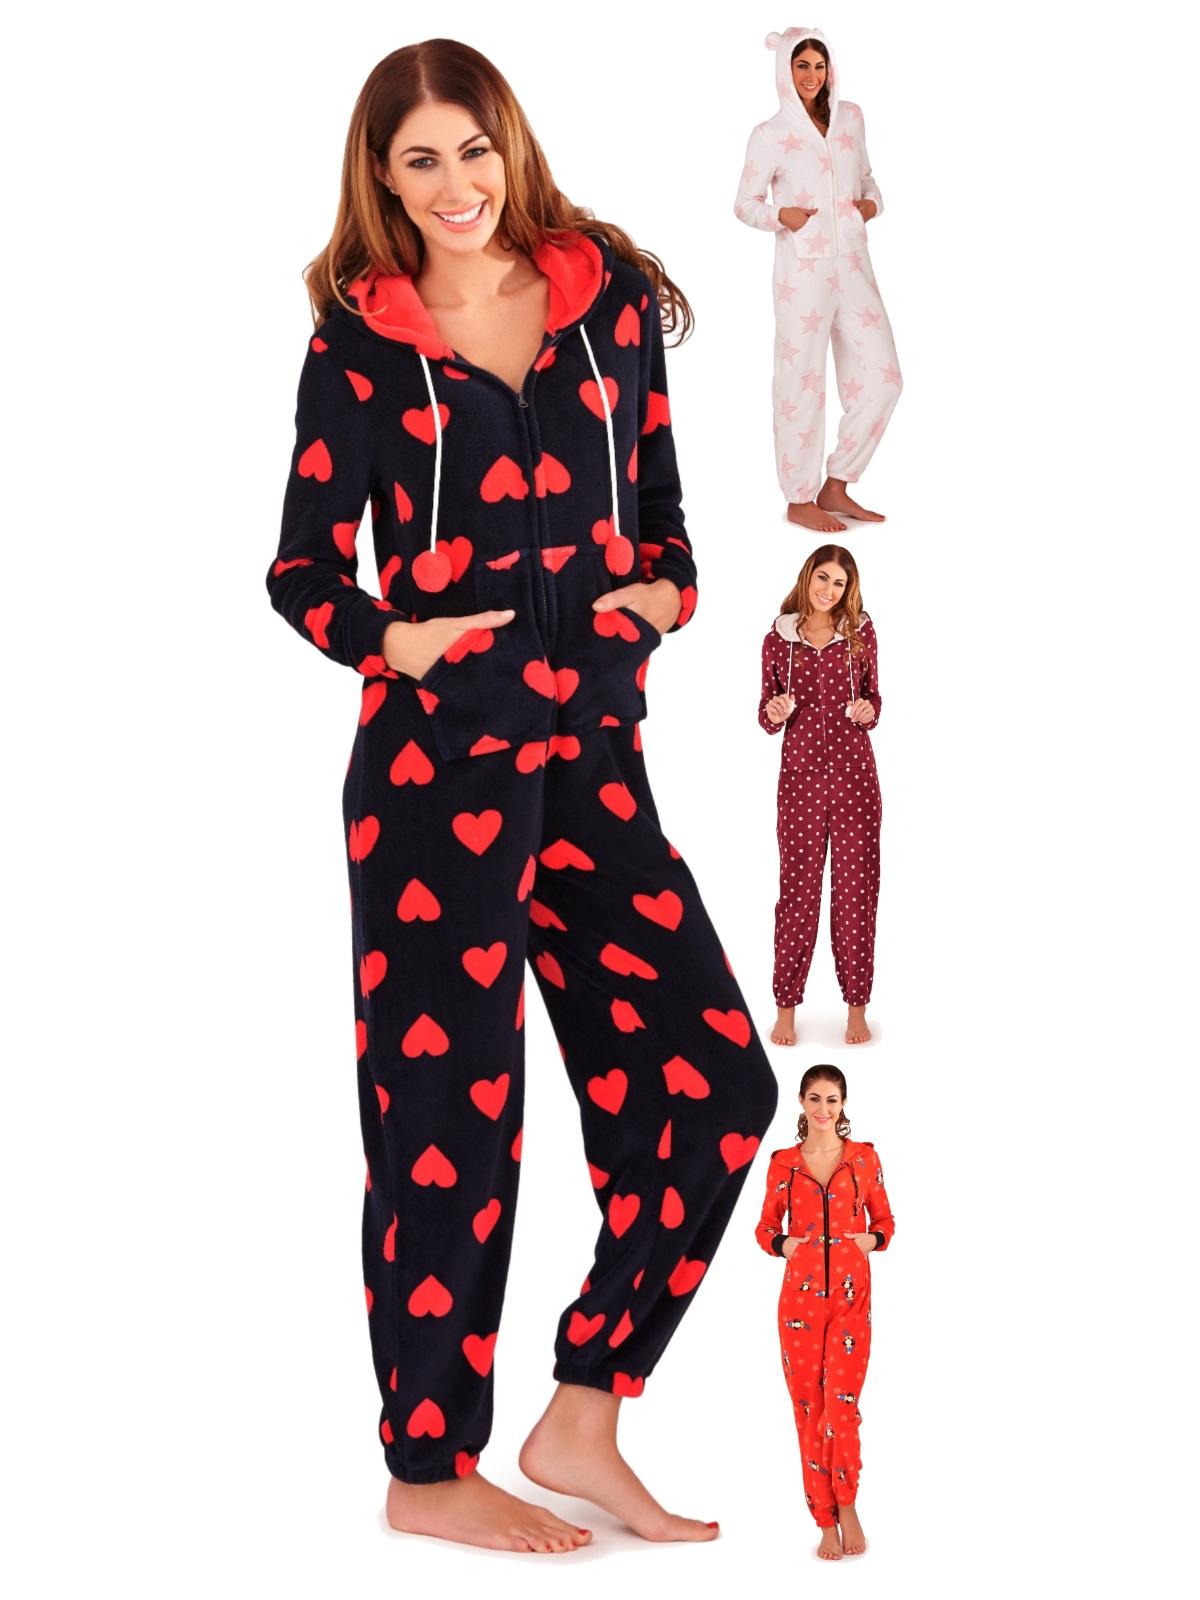 73bedd142135 Womens Luxury All In One Hooded Pyjamas Pjs Jumpsuit Ladies Onezie Onezee  Size